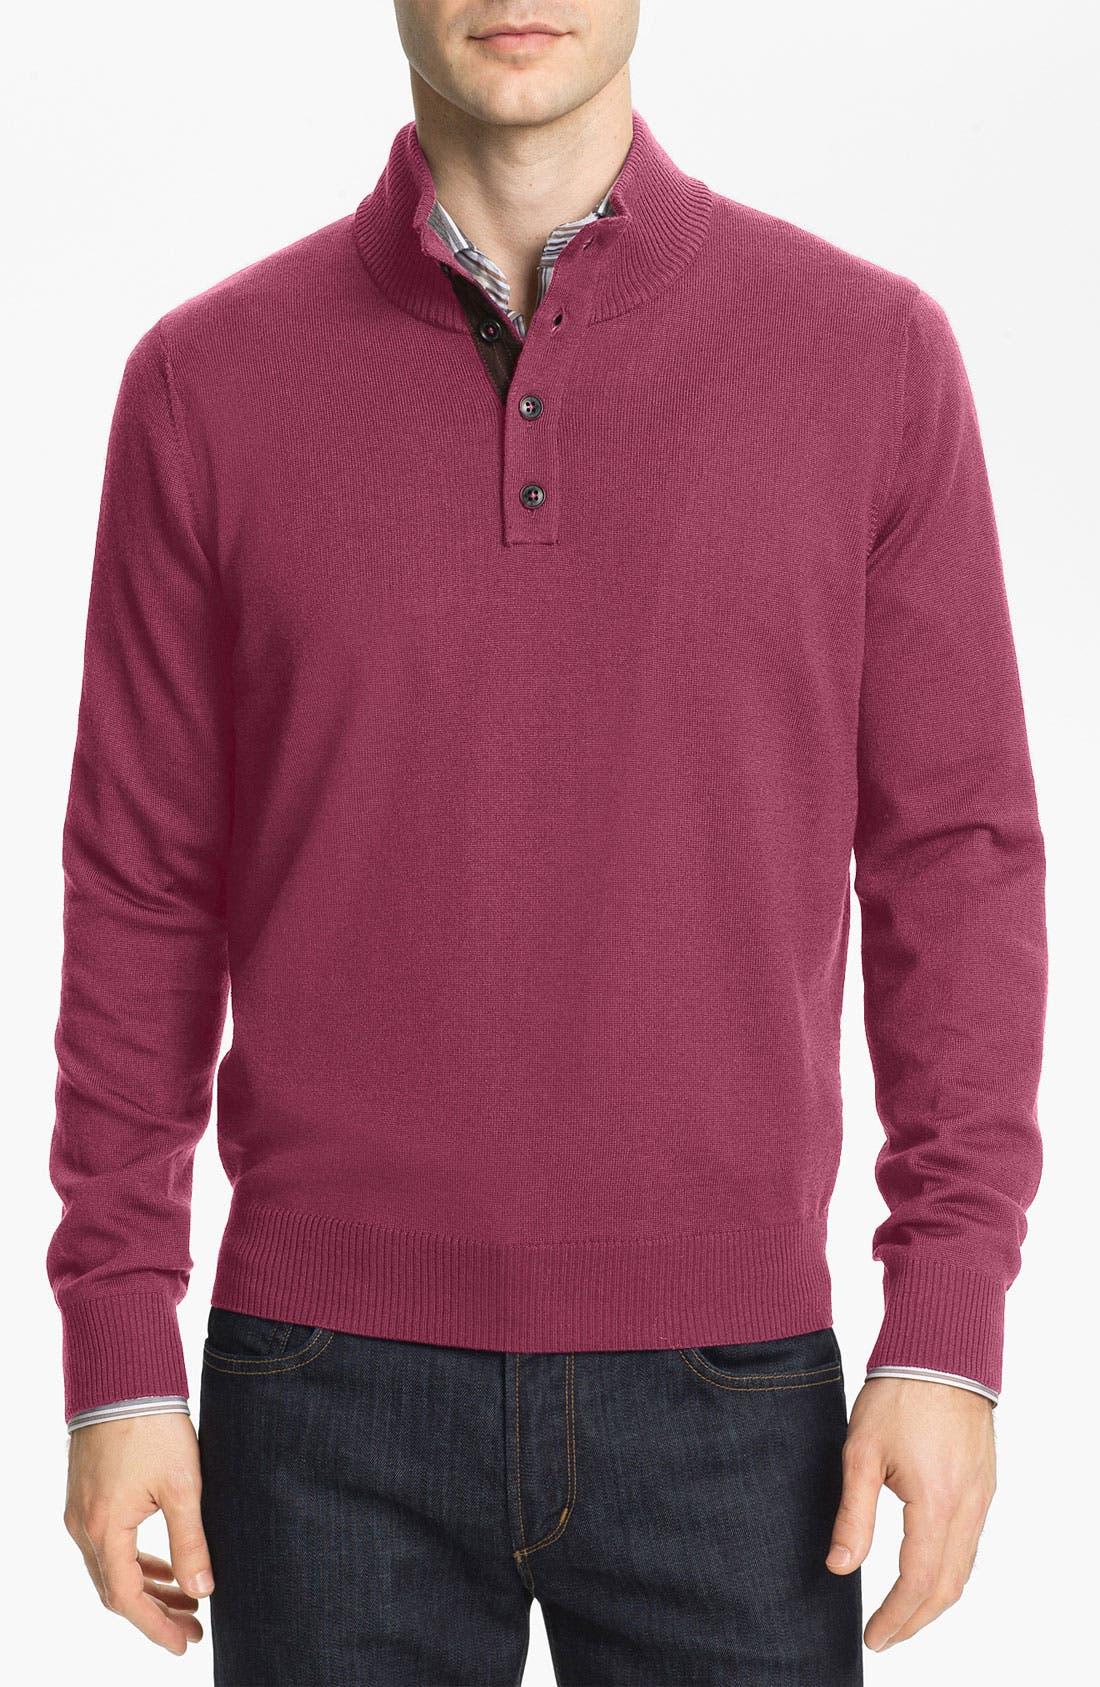 Alternate Image 1 Selected - Thomas Dean Mock Neck Merino Wool Sweater